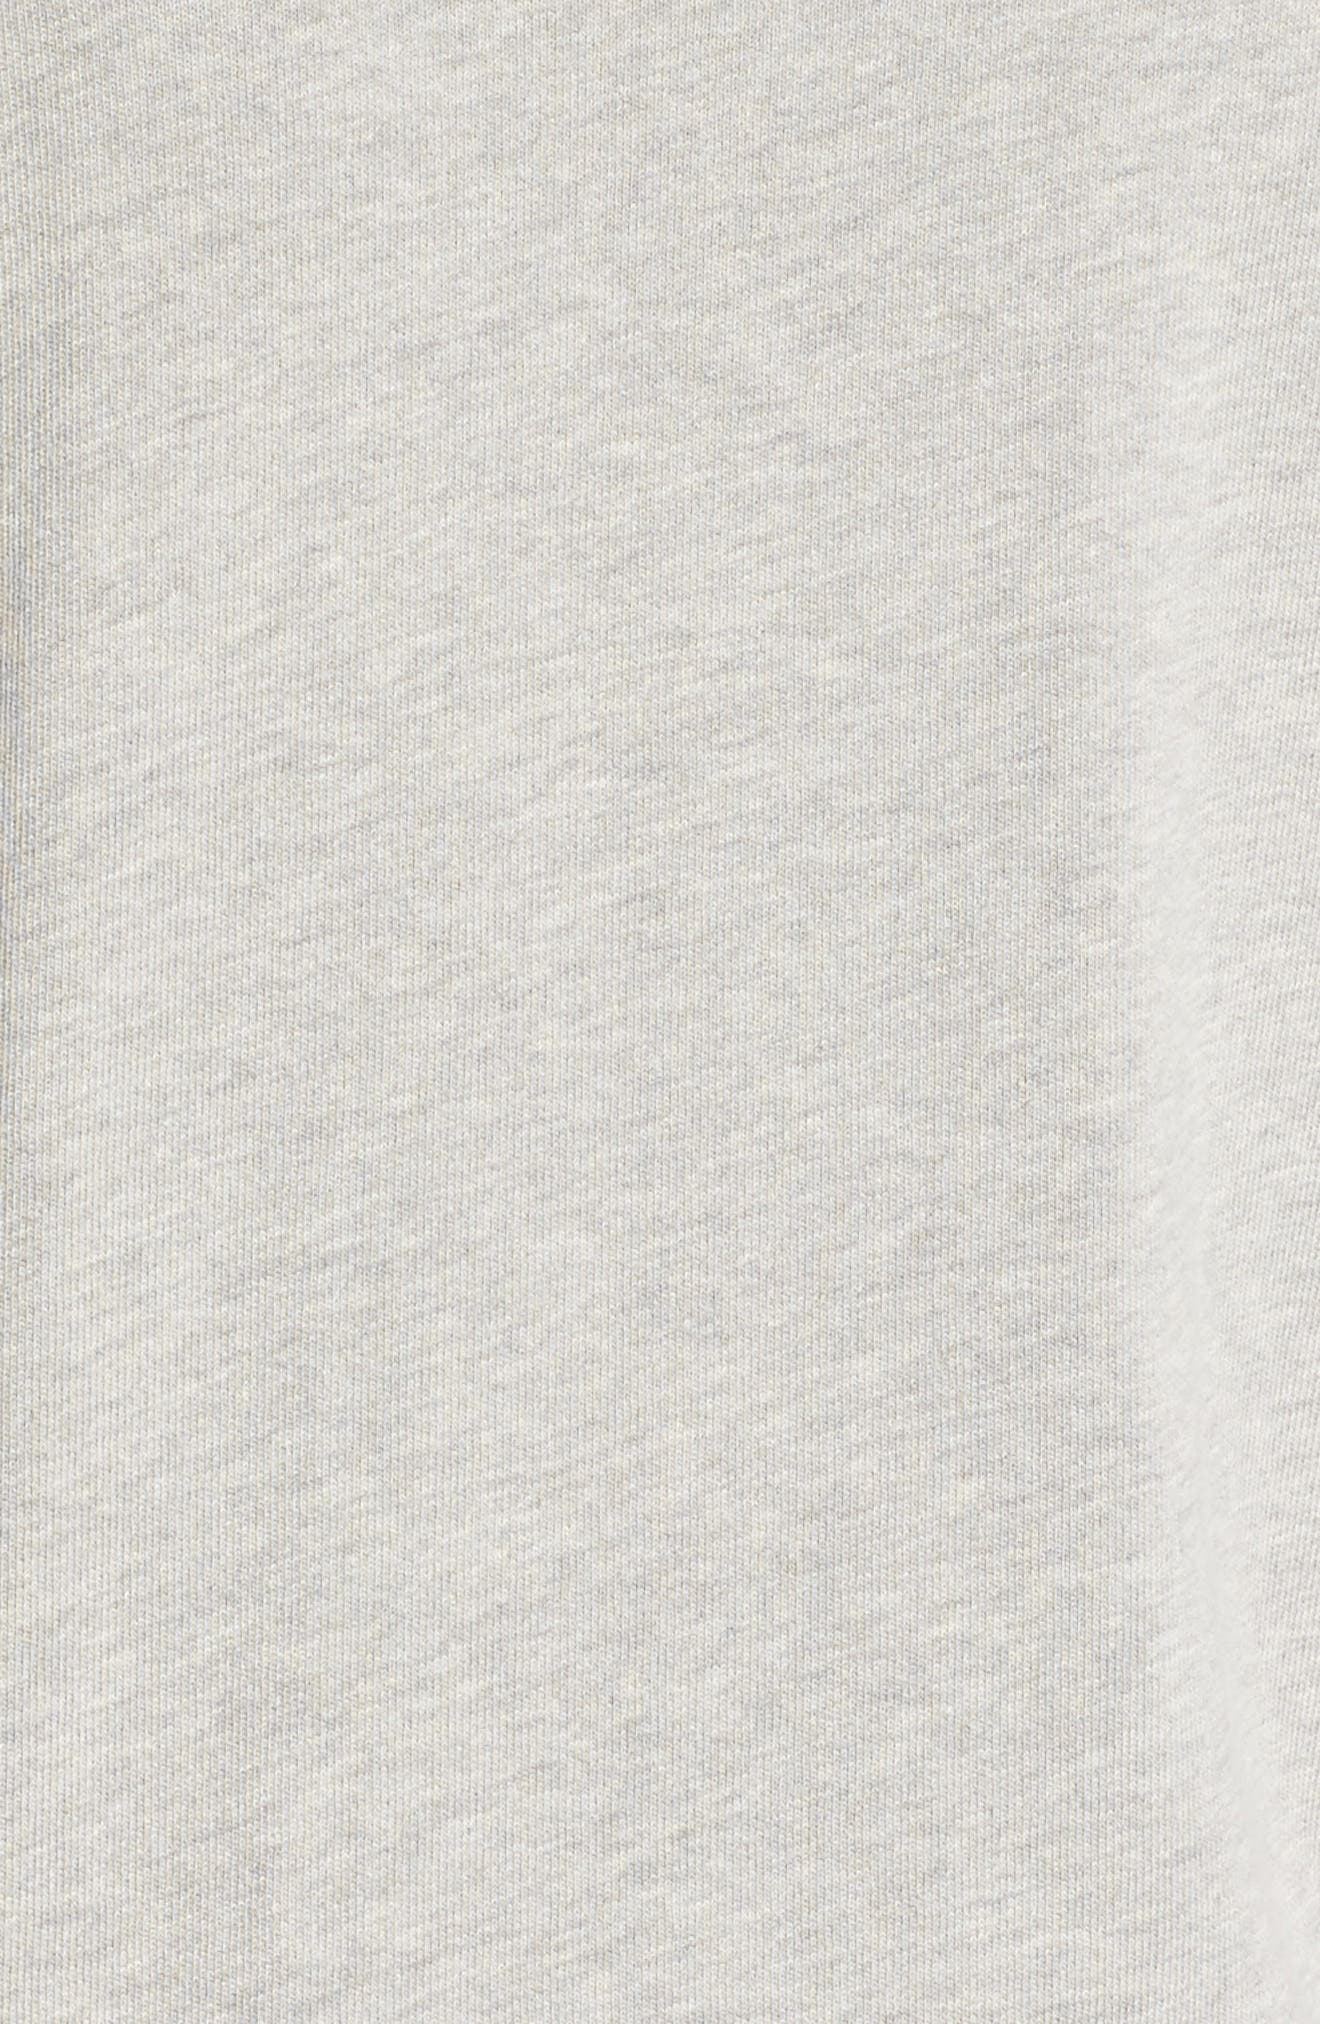 NFL Atlanta Falcons Hacci Sweatshirt,                             Alternate thumbnail 5, color,                             030